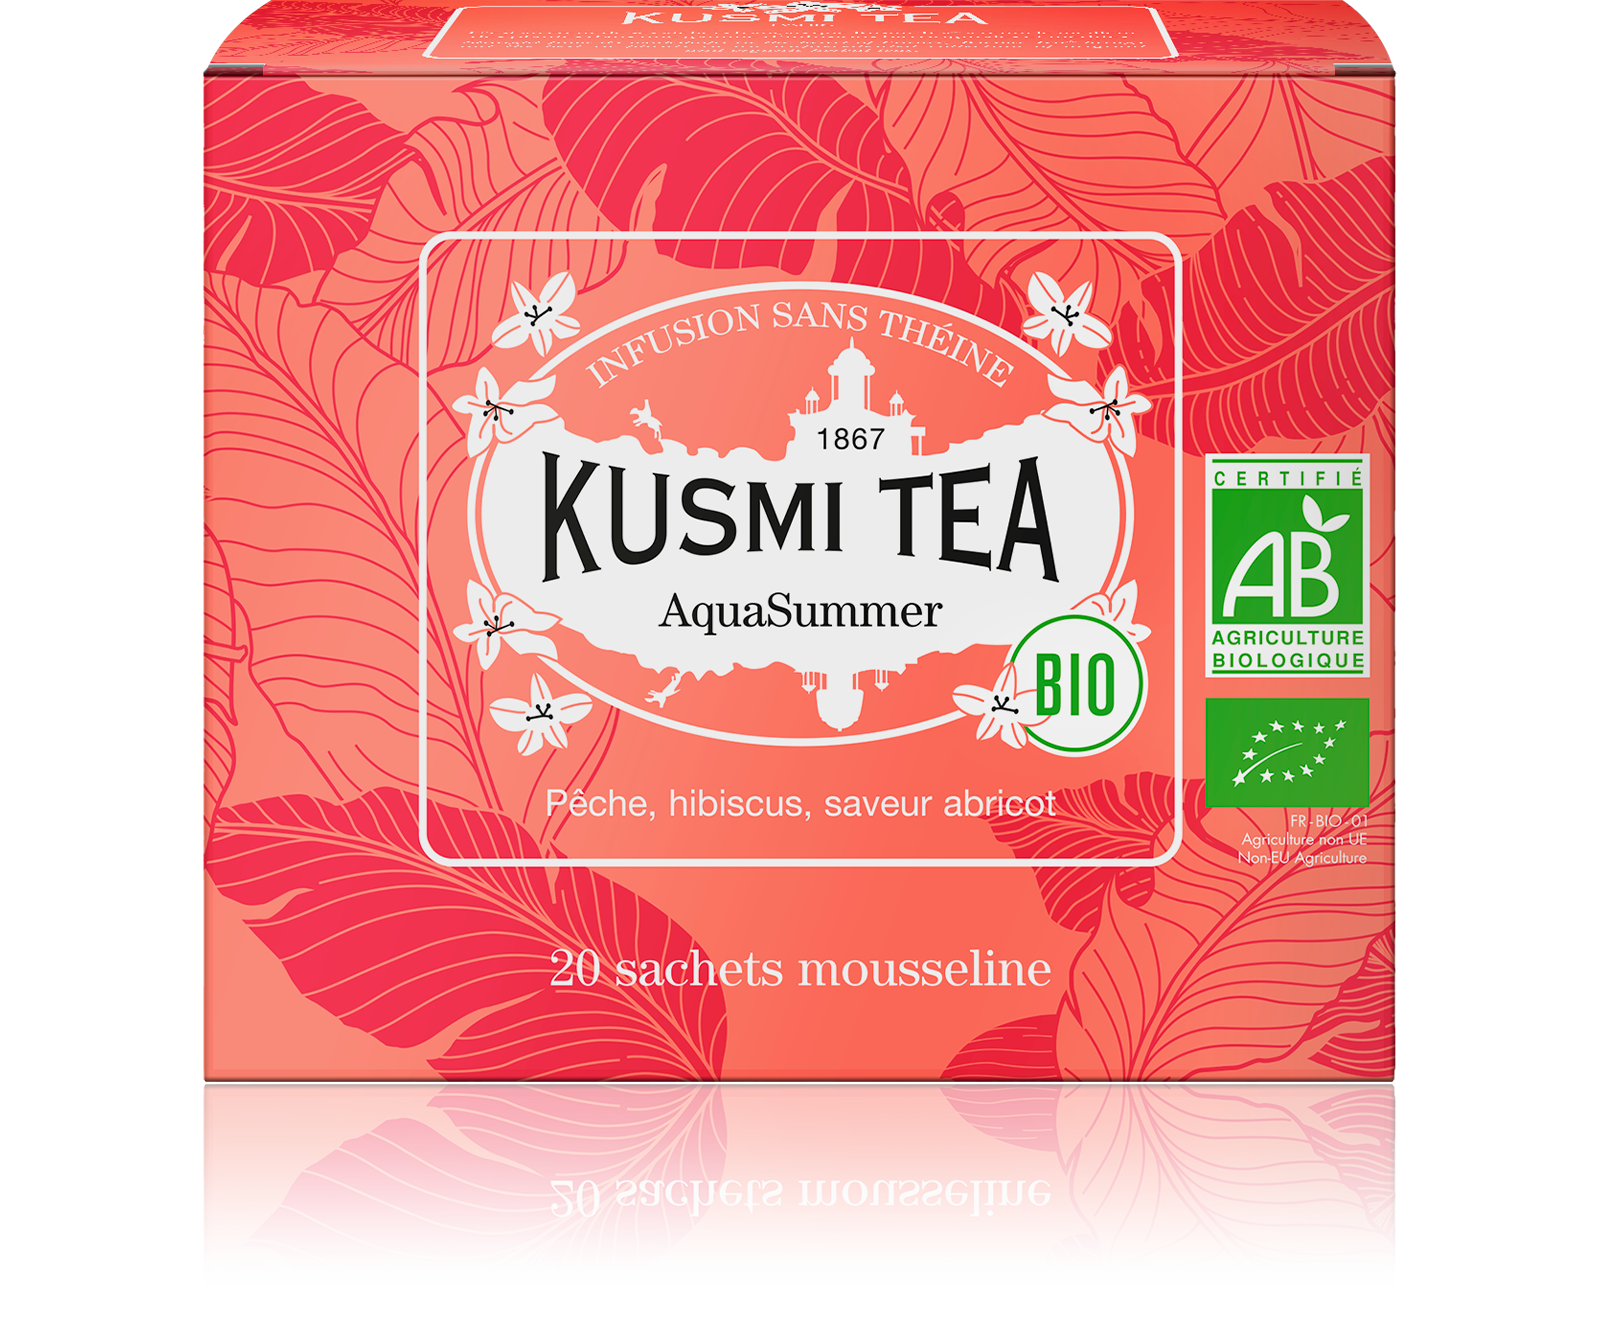 Infusion d'hibiscus bio - AquaSummer (Infusion de fruits bio) - Sachets - Kusmi Tea